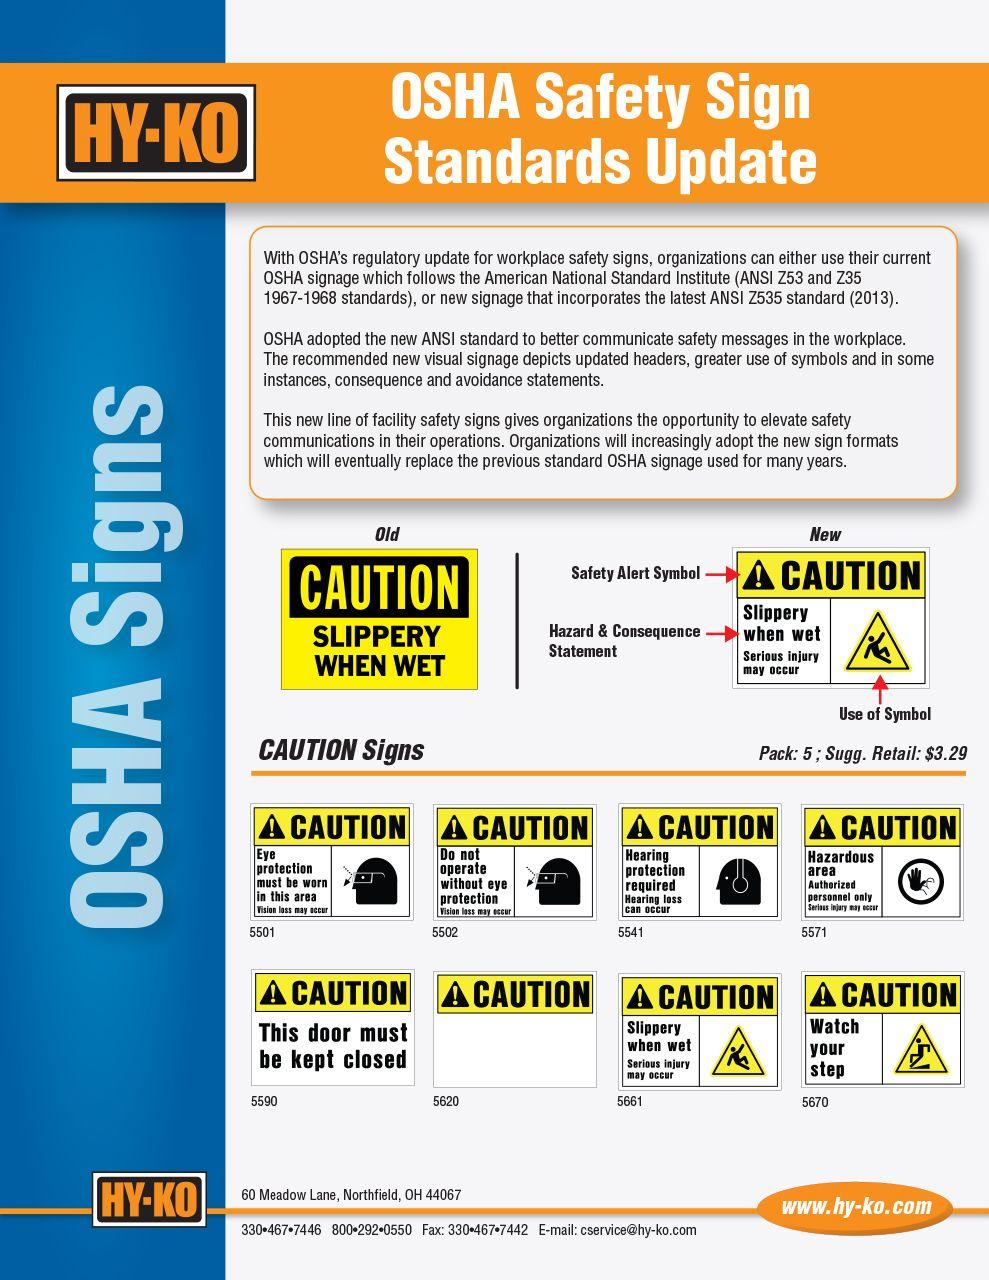 OSHA Safety Sign Strandards Update